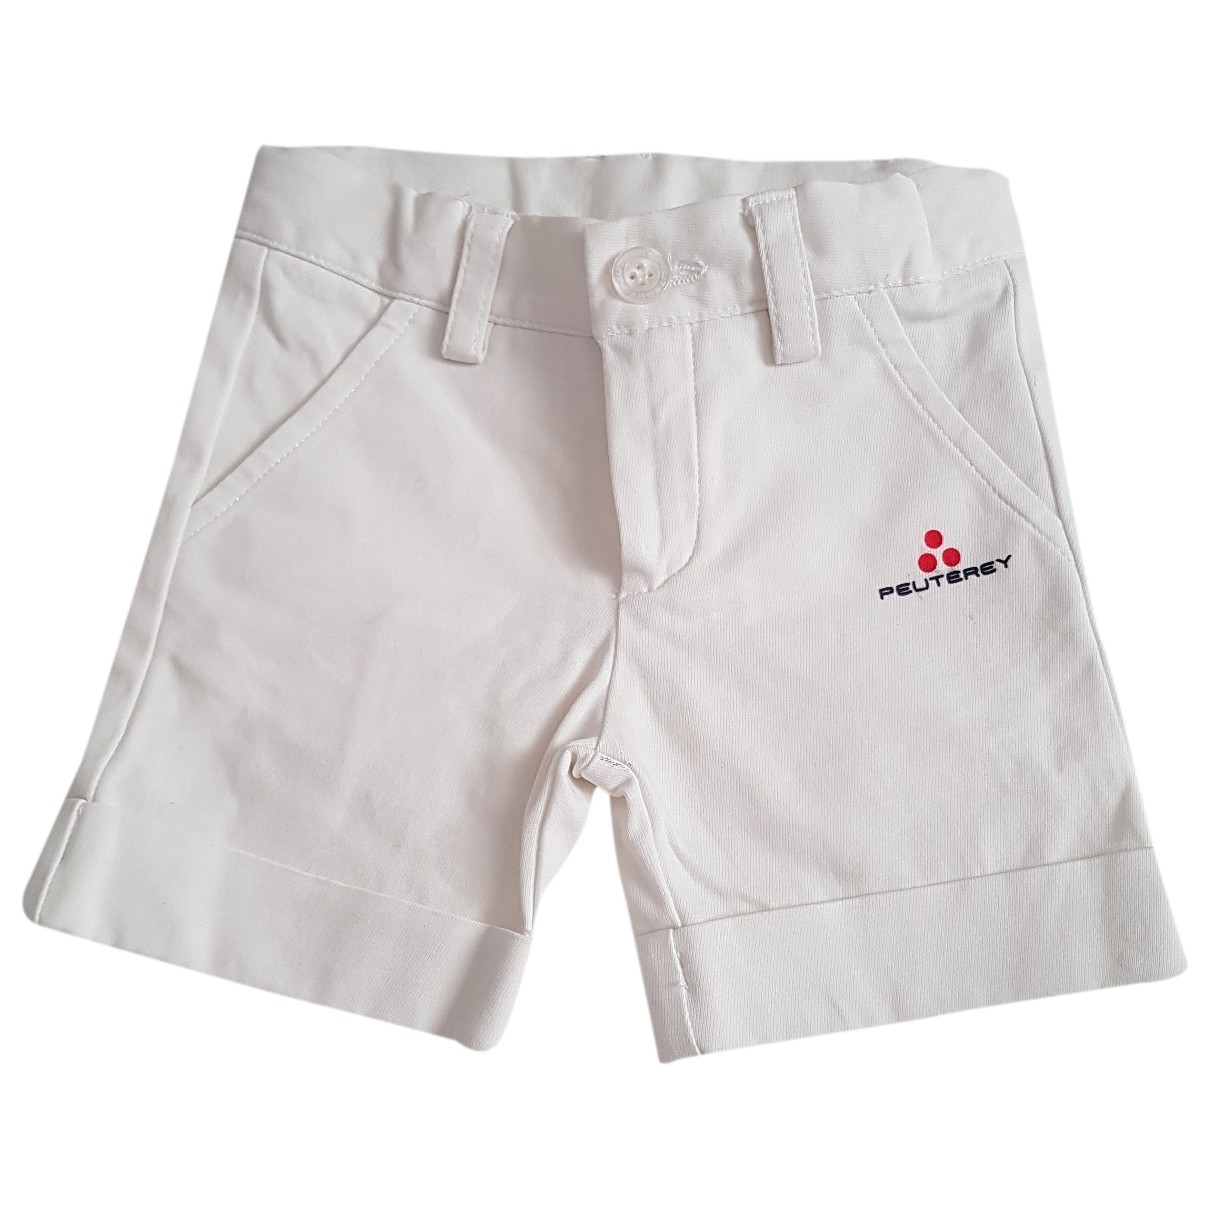 Pantalon corto Peuterey